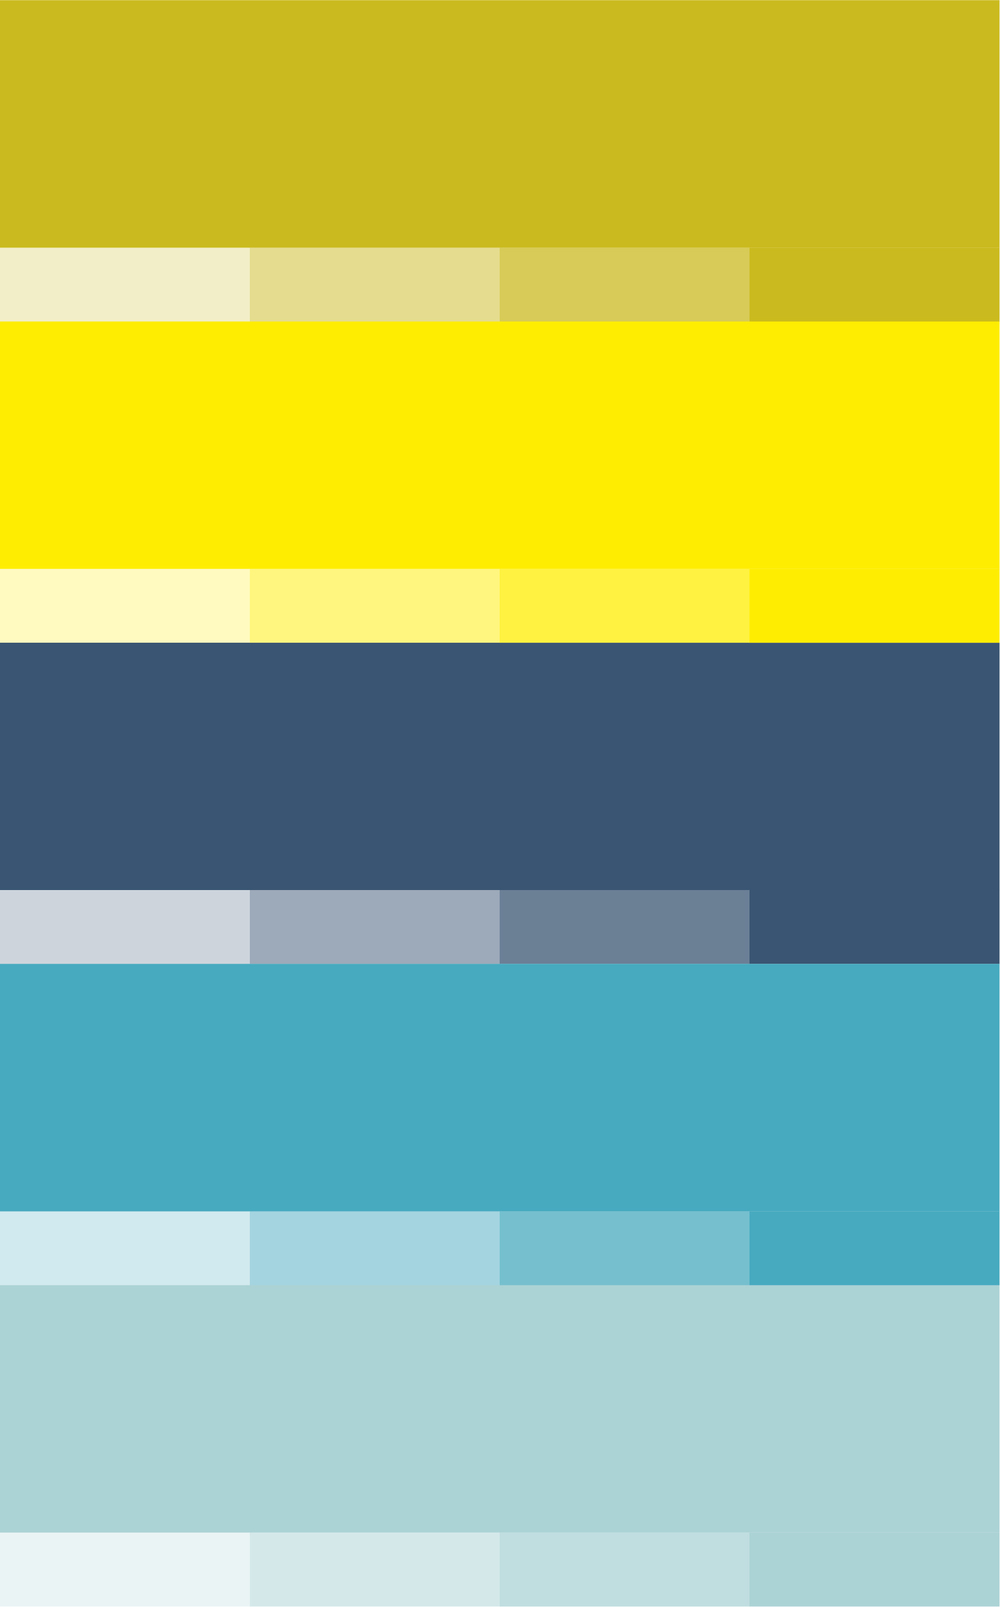 color-09.jpg